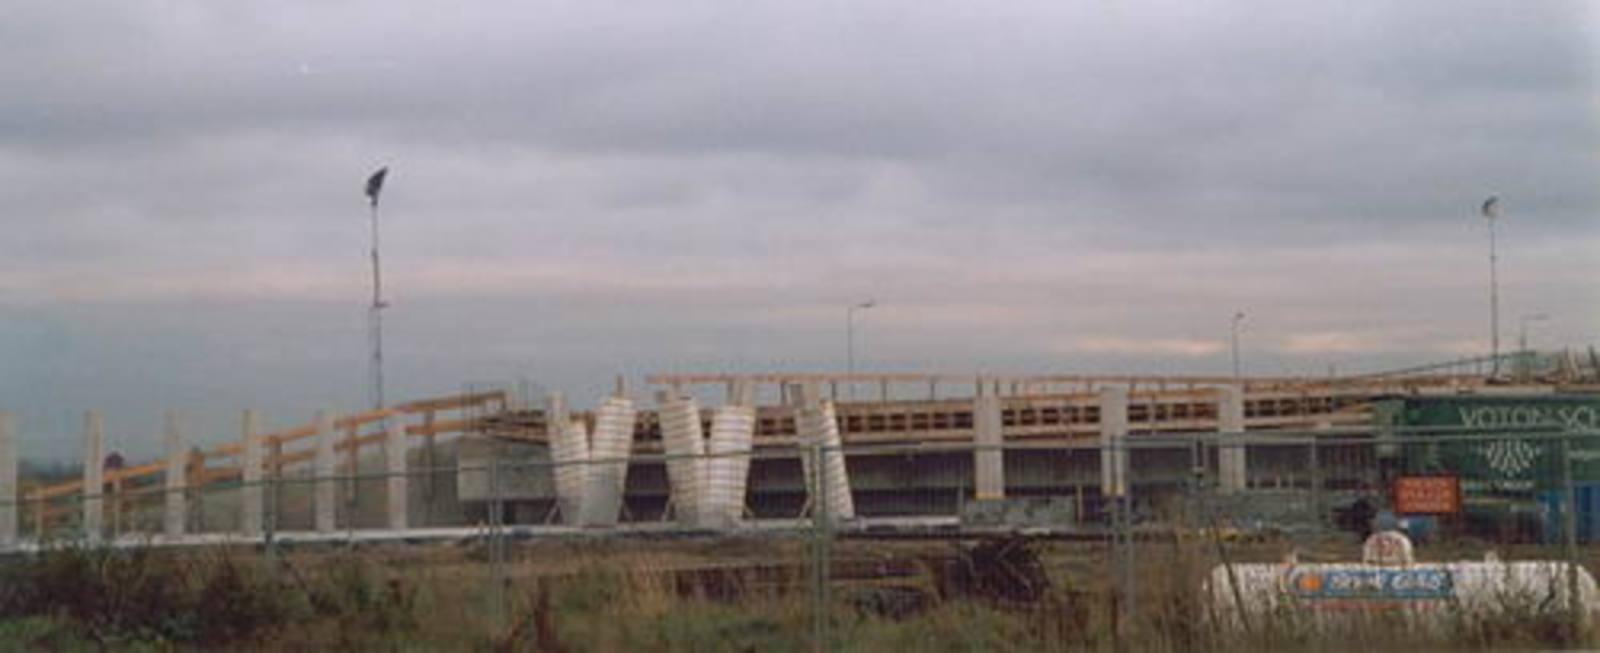 Hoofdweg W 0370± bouw Viaduct Taxibaan Schiphol 04